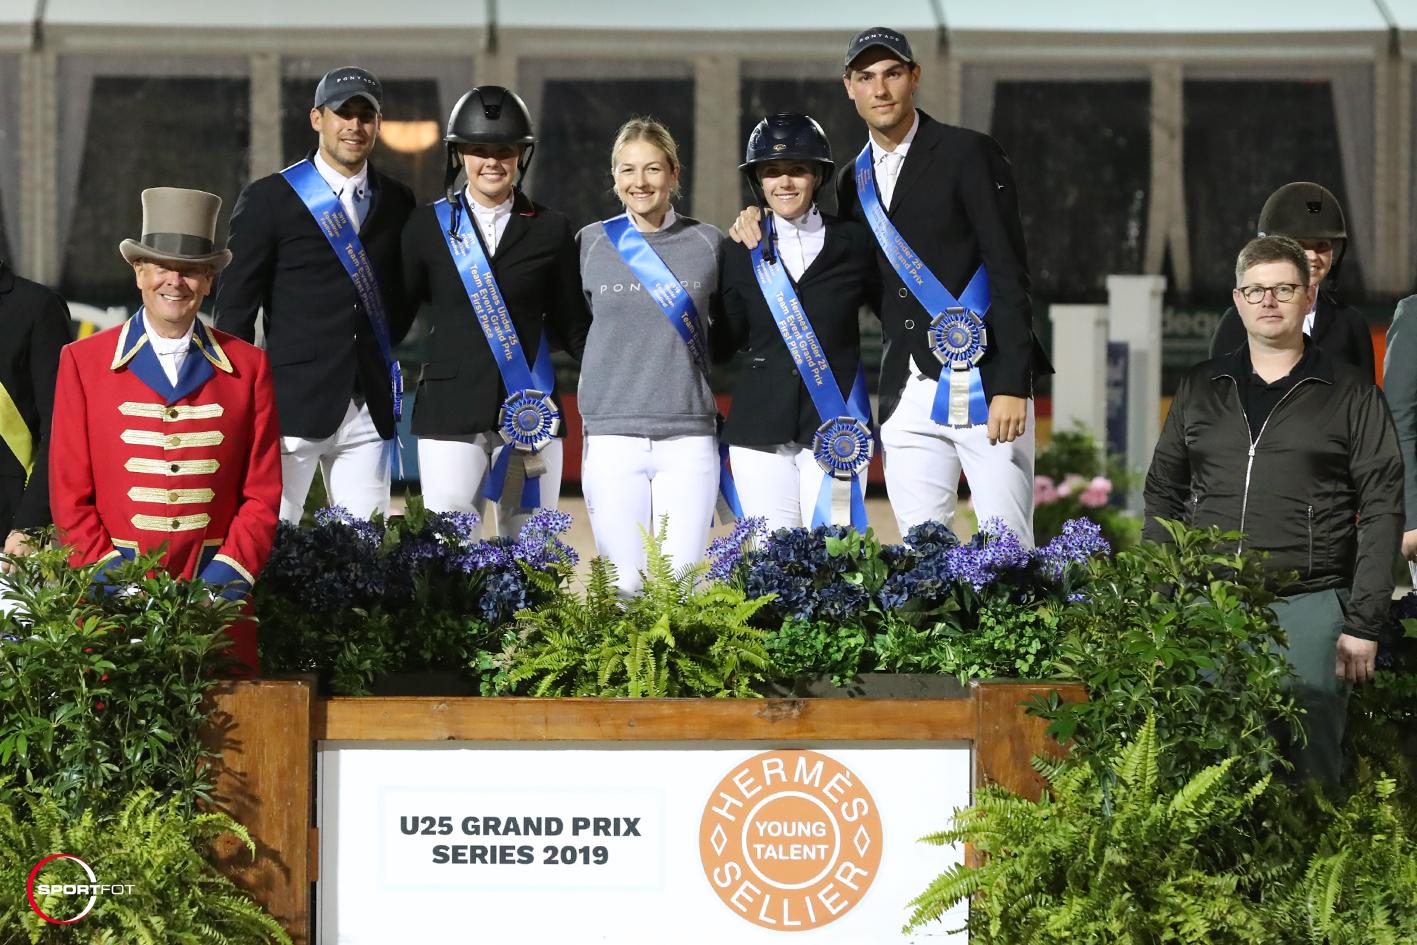 U25 Team Event first place podium 404_2708 Sportfot